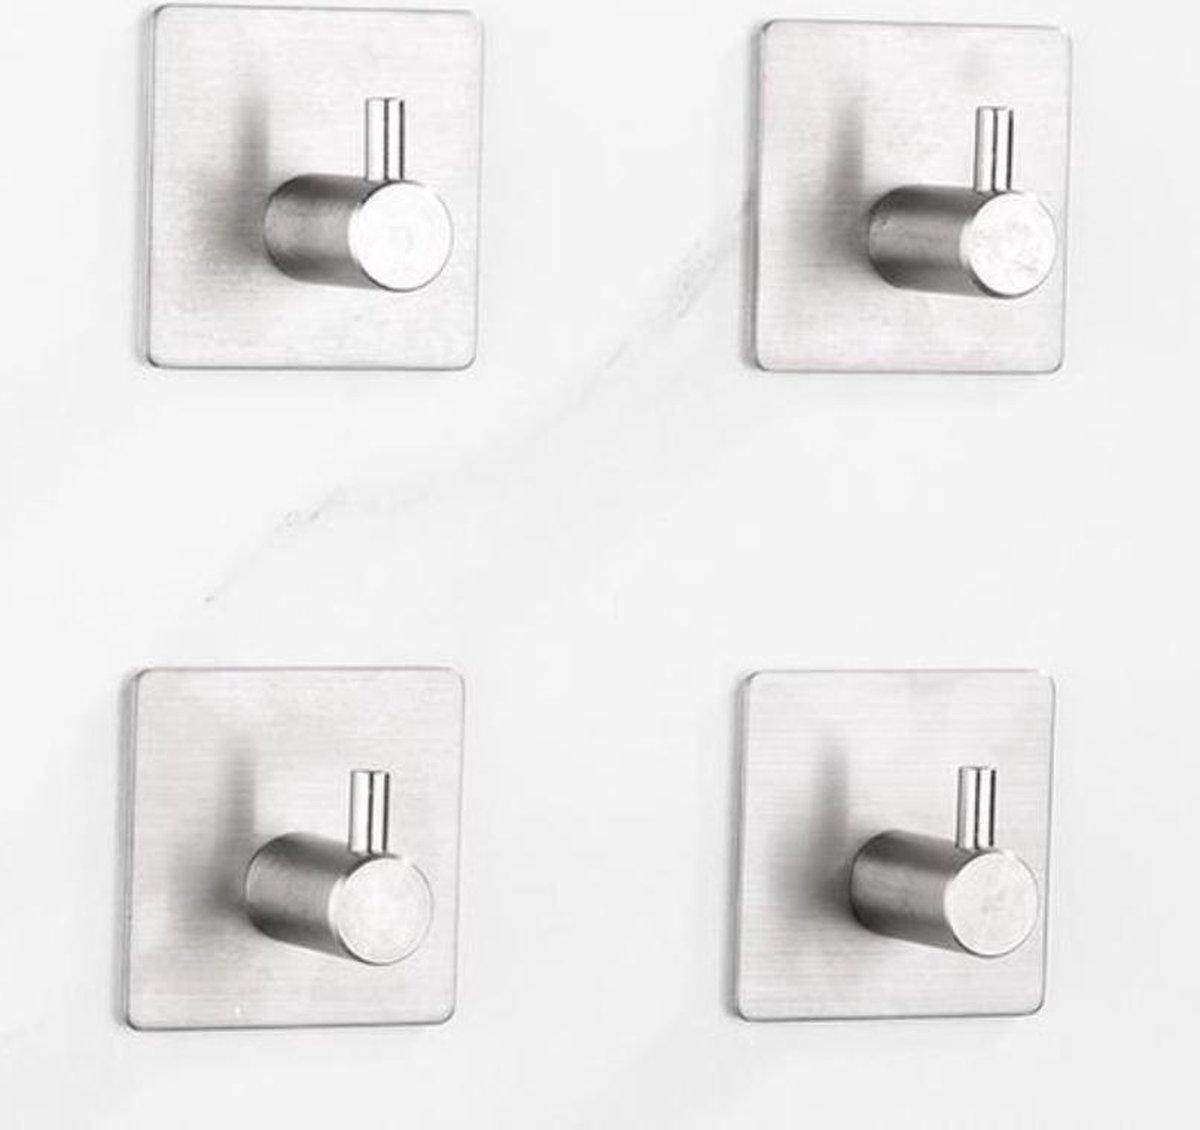 Jumalu - Handdoekhaak - Handdoekhaakjes zelfklevend - RVS handdoekhaakjes - 4 stuks - Zilver - Zelfklevend - Handdoek haakjes